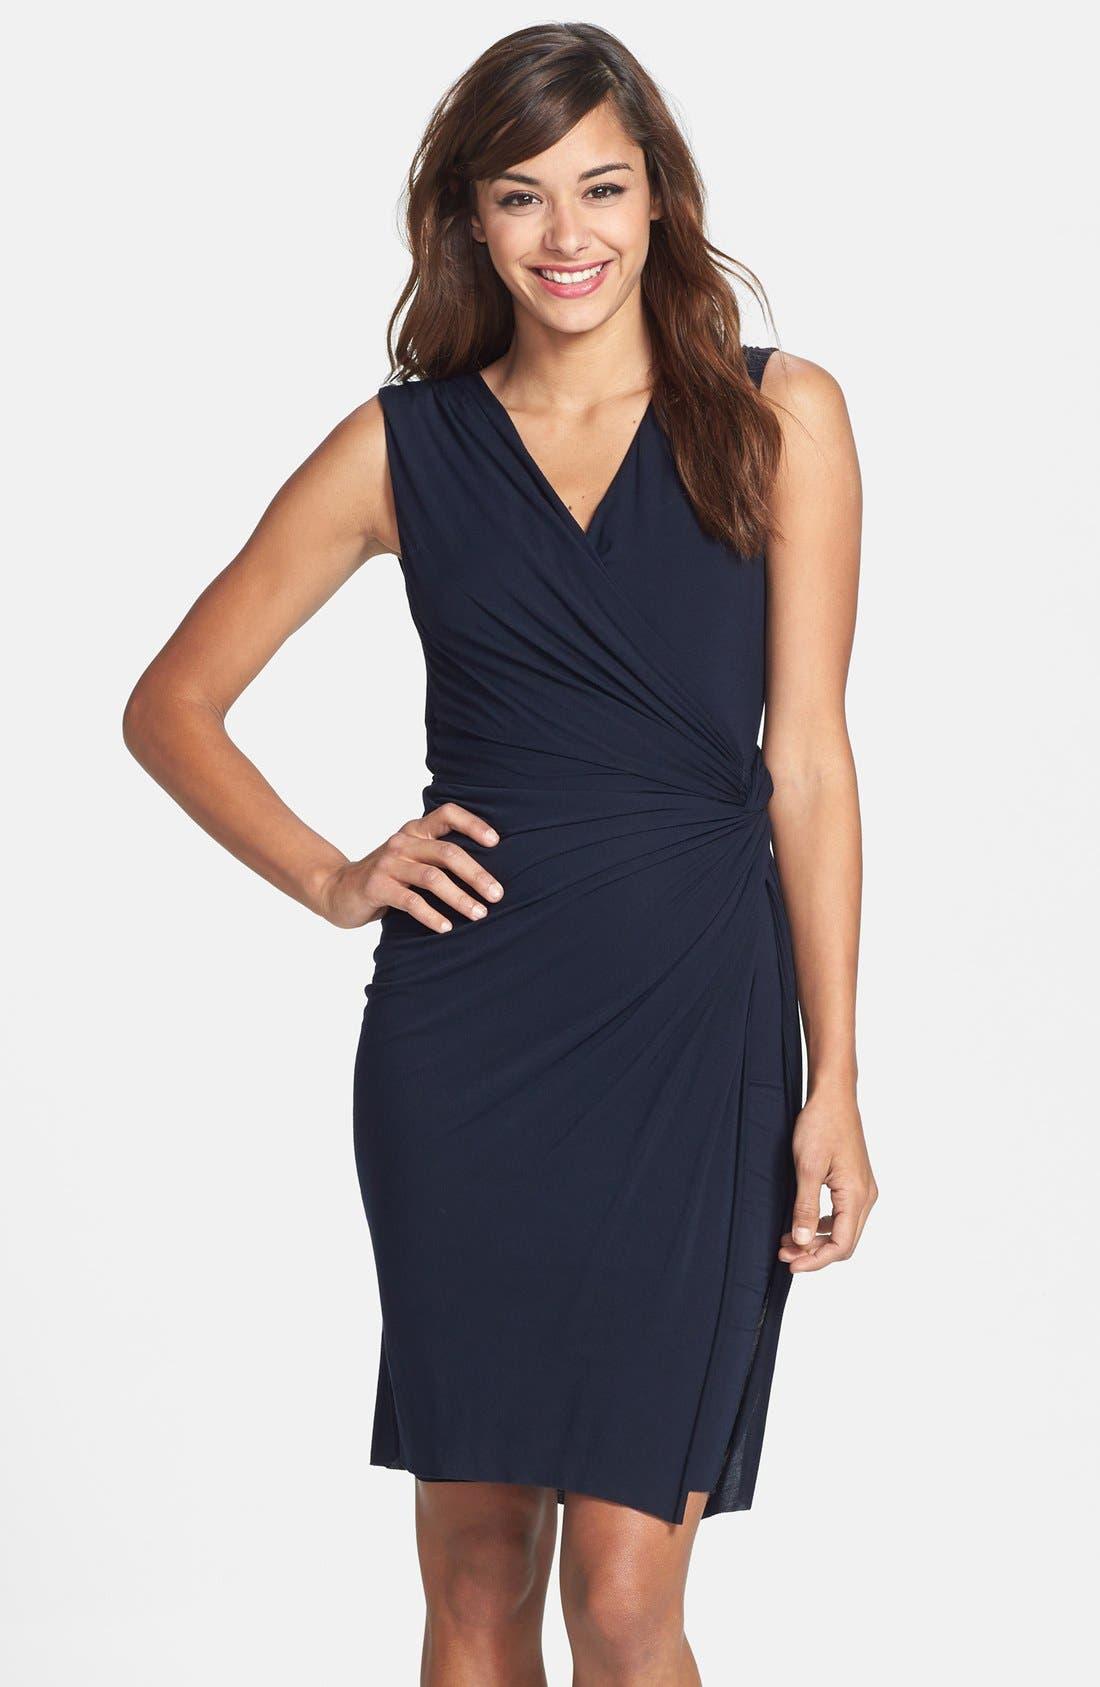 Main Image - B44 Dressed by Bailey 44 'Drop Kick' Faux Wrap Jersey Dress